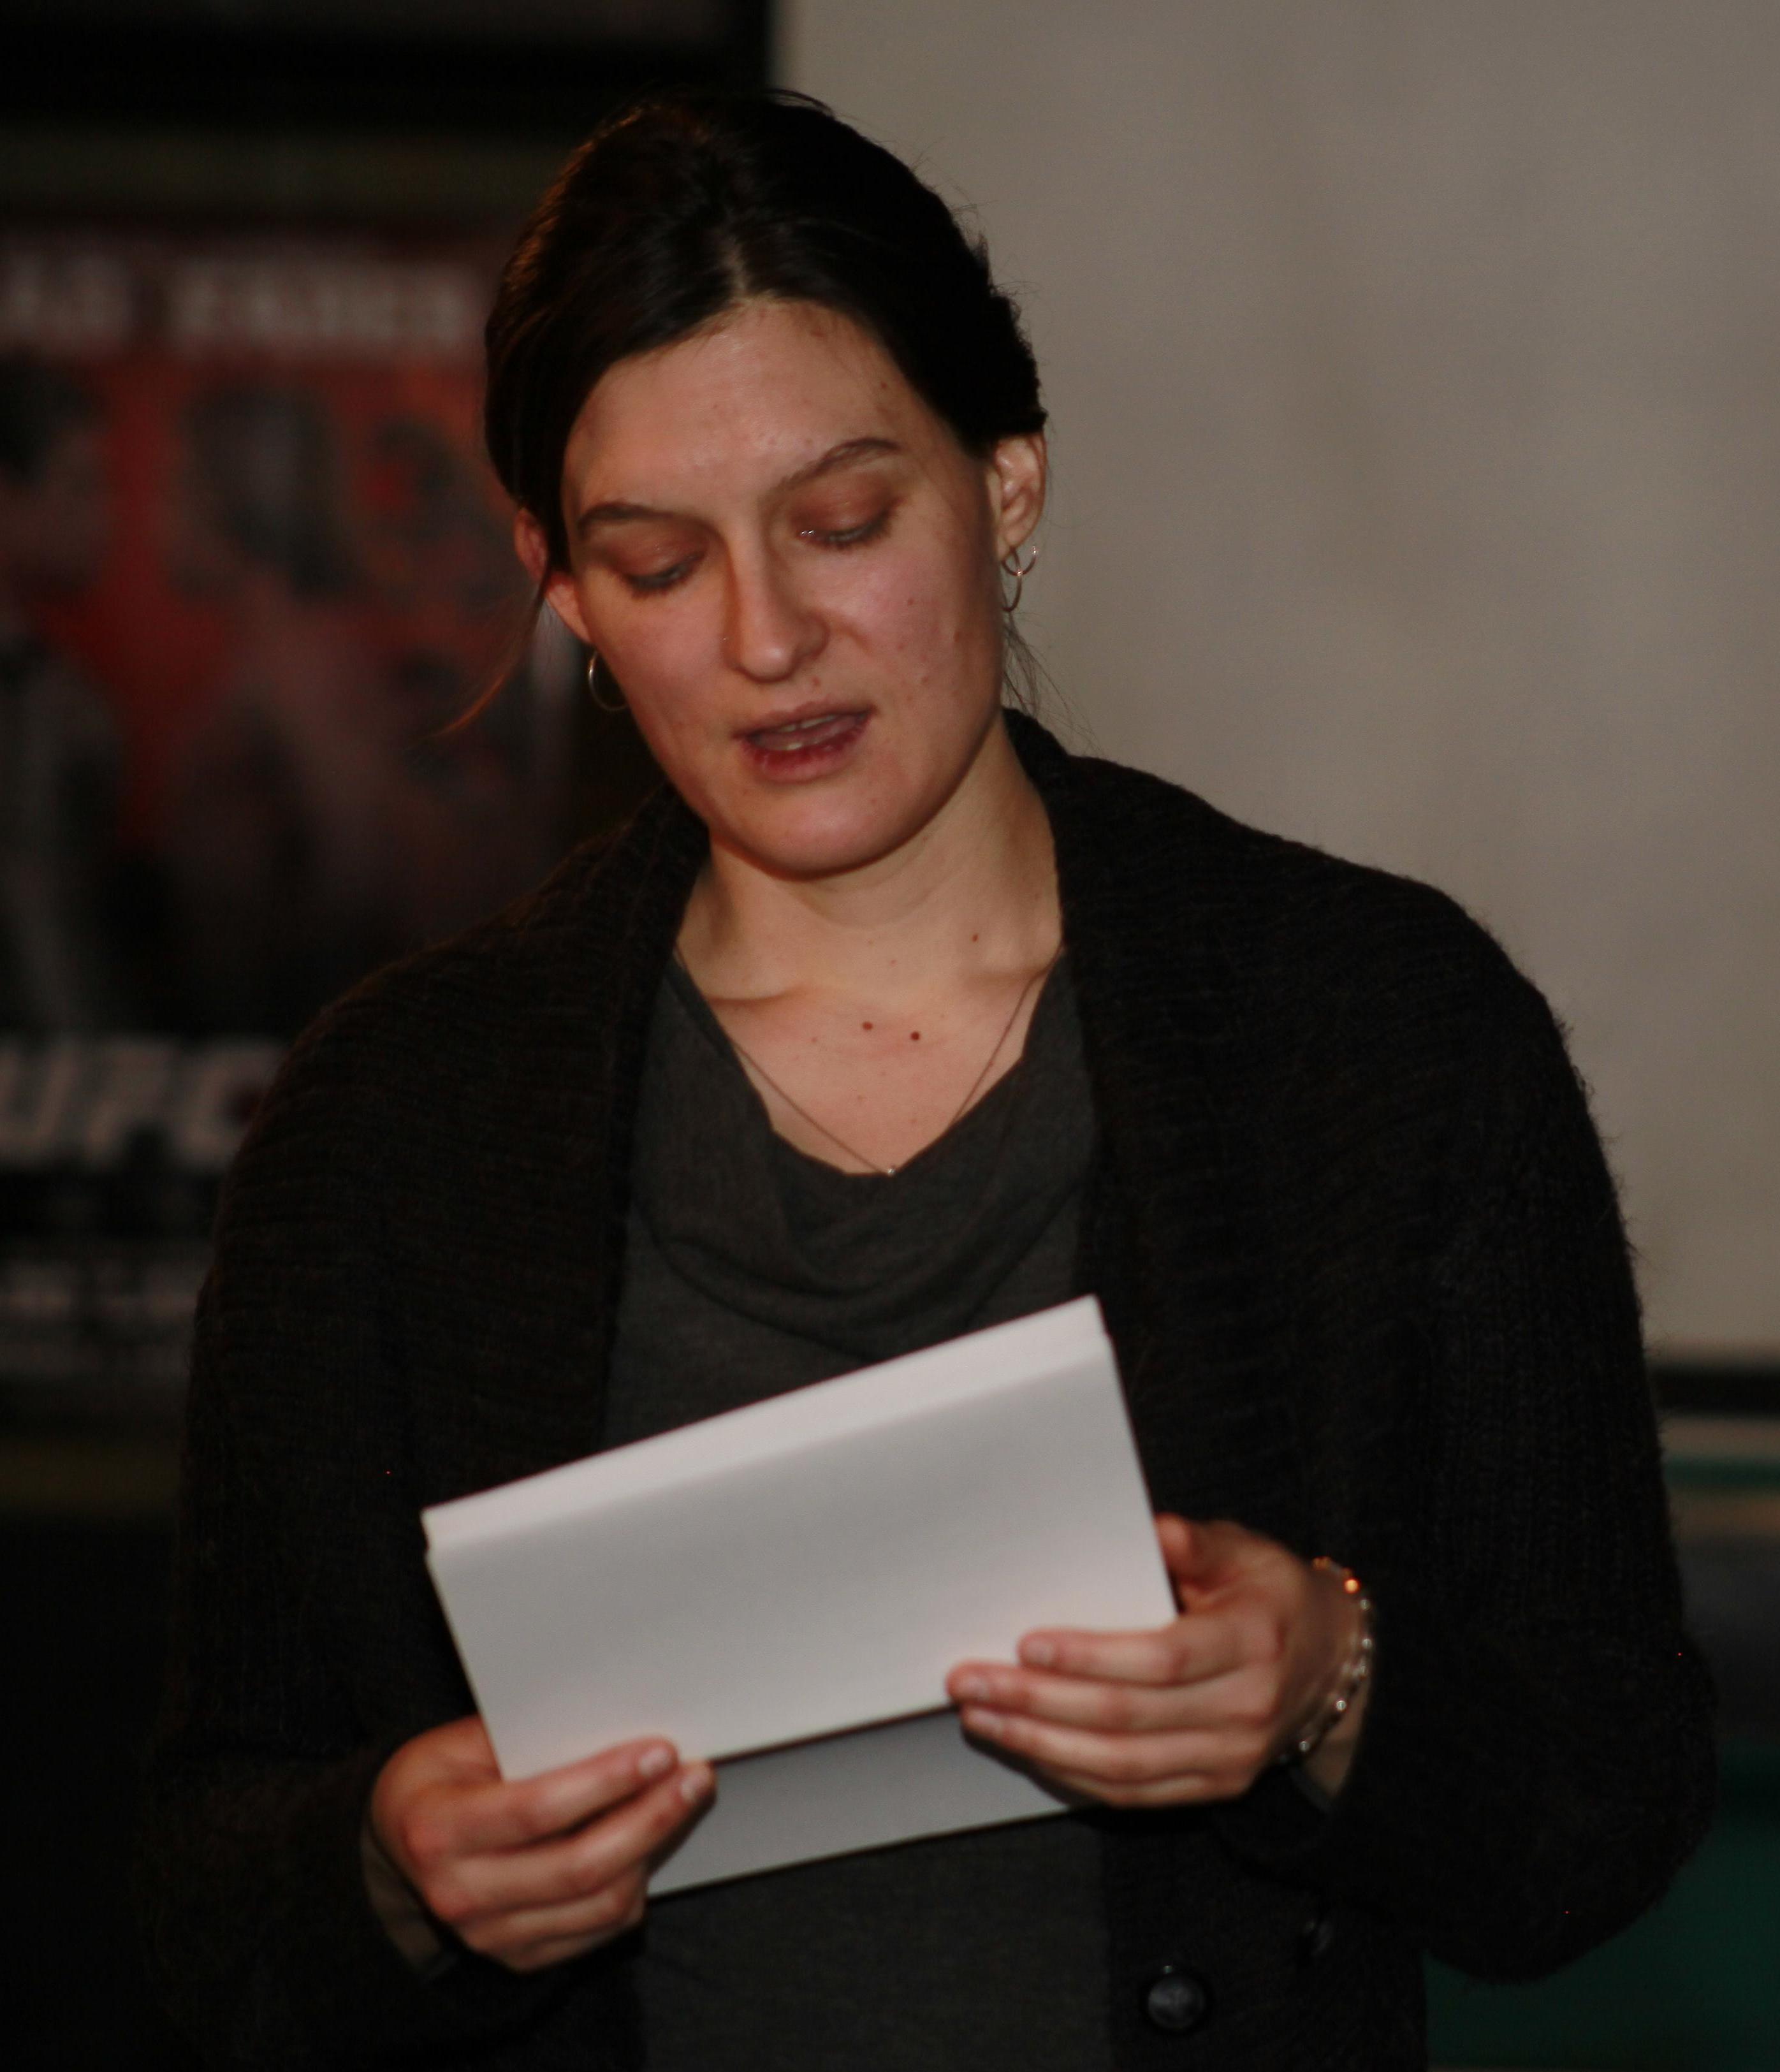 Katia Grubisic